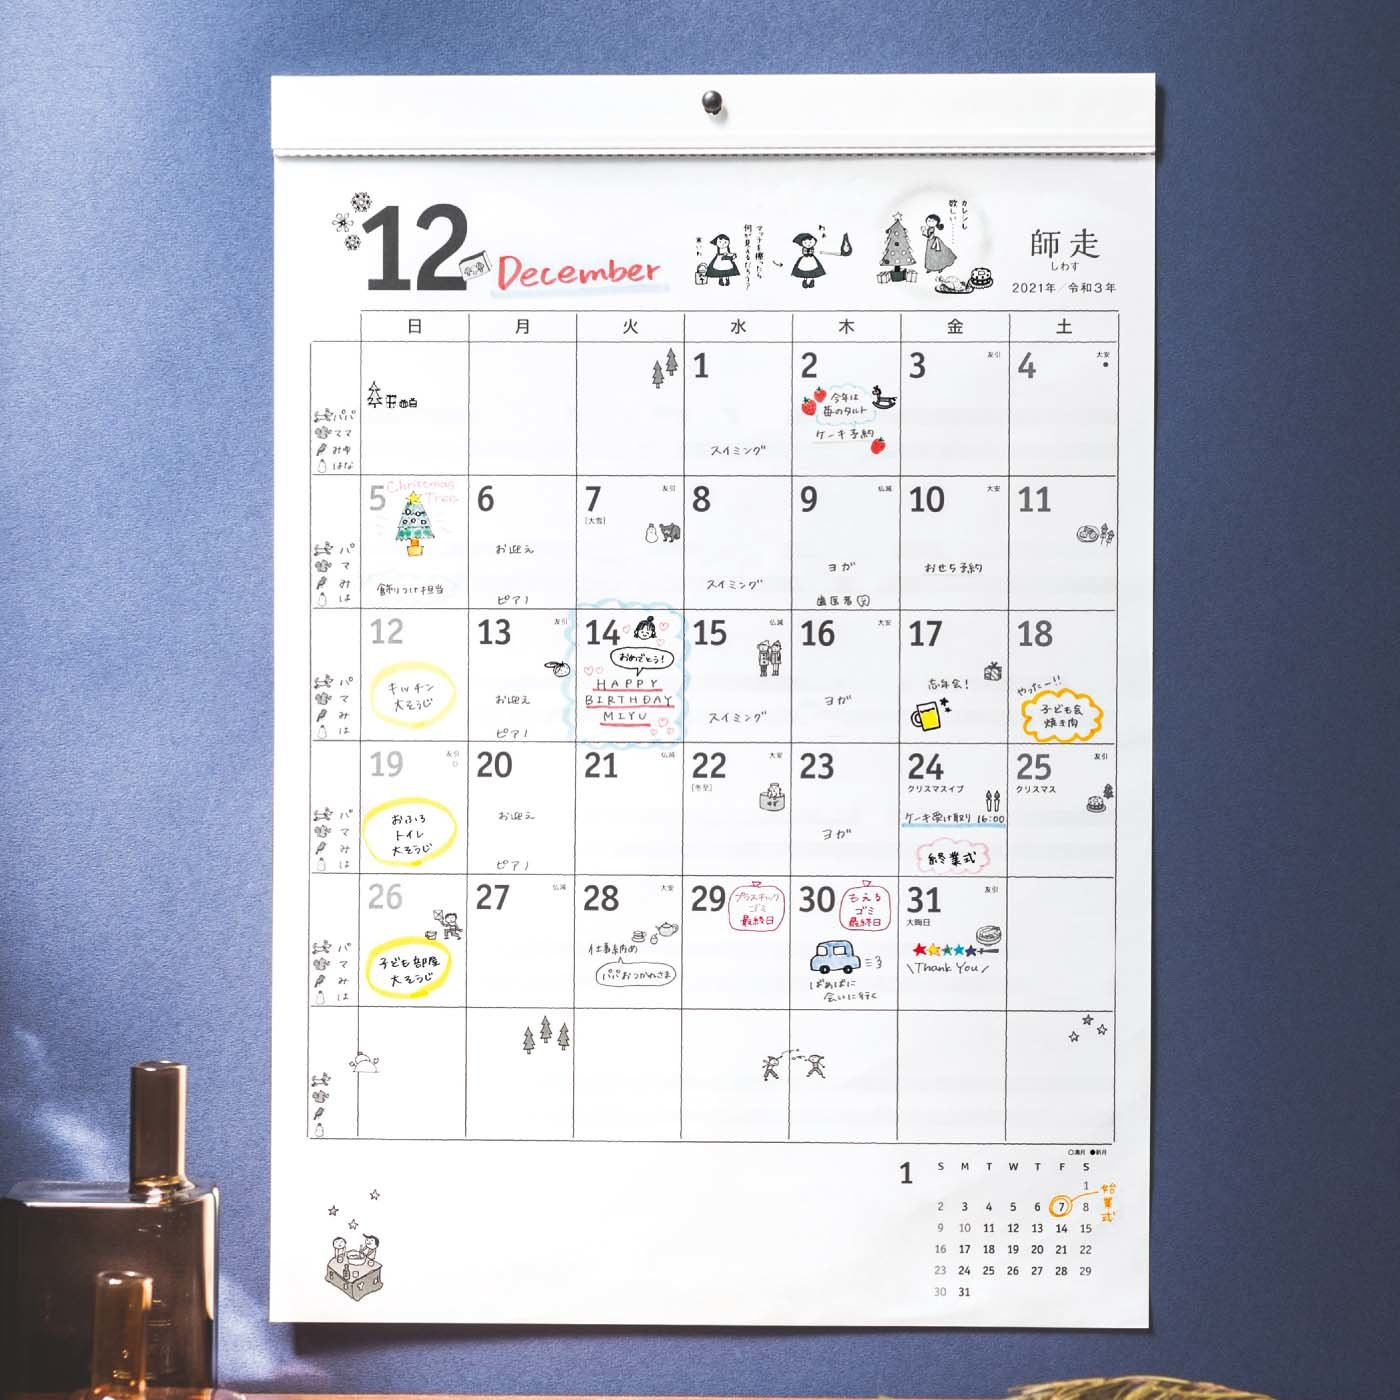 SF STUDIO みんなのスケジュール共有☆ファミリーカレンダー(日曜始まり) 2021